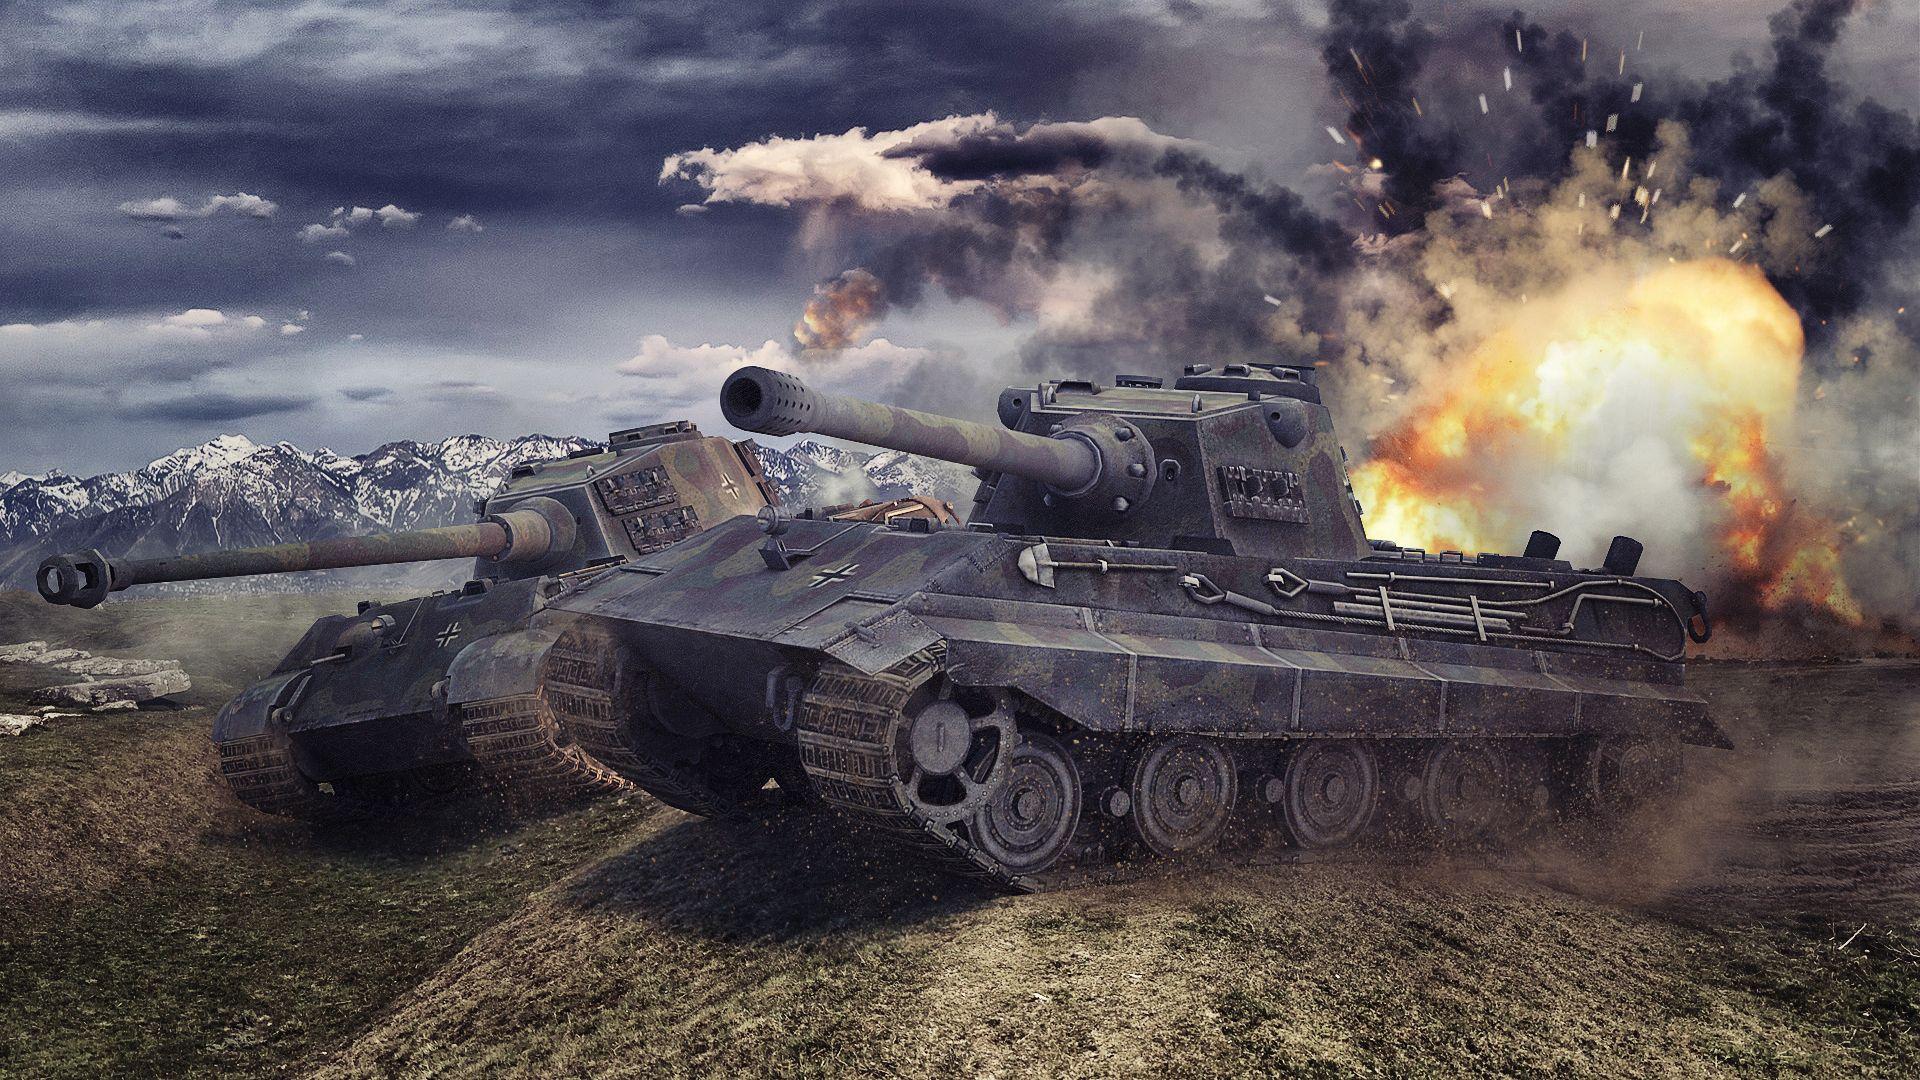 World Of Tanks Wallpaper Google Search Tank Wallpaper World Of Tanks Military Wallpaper